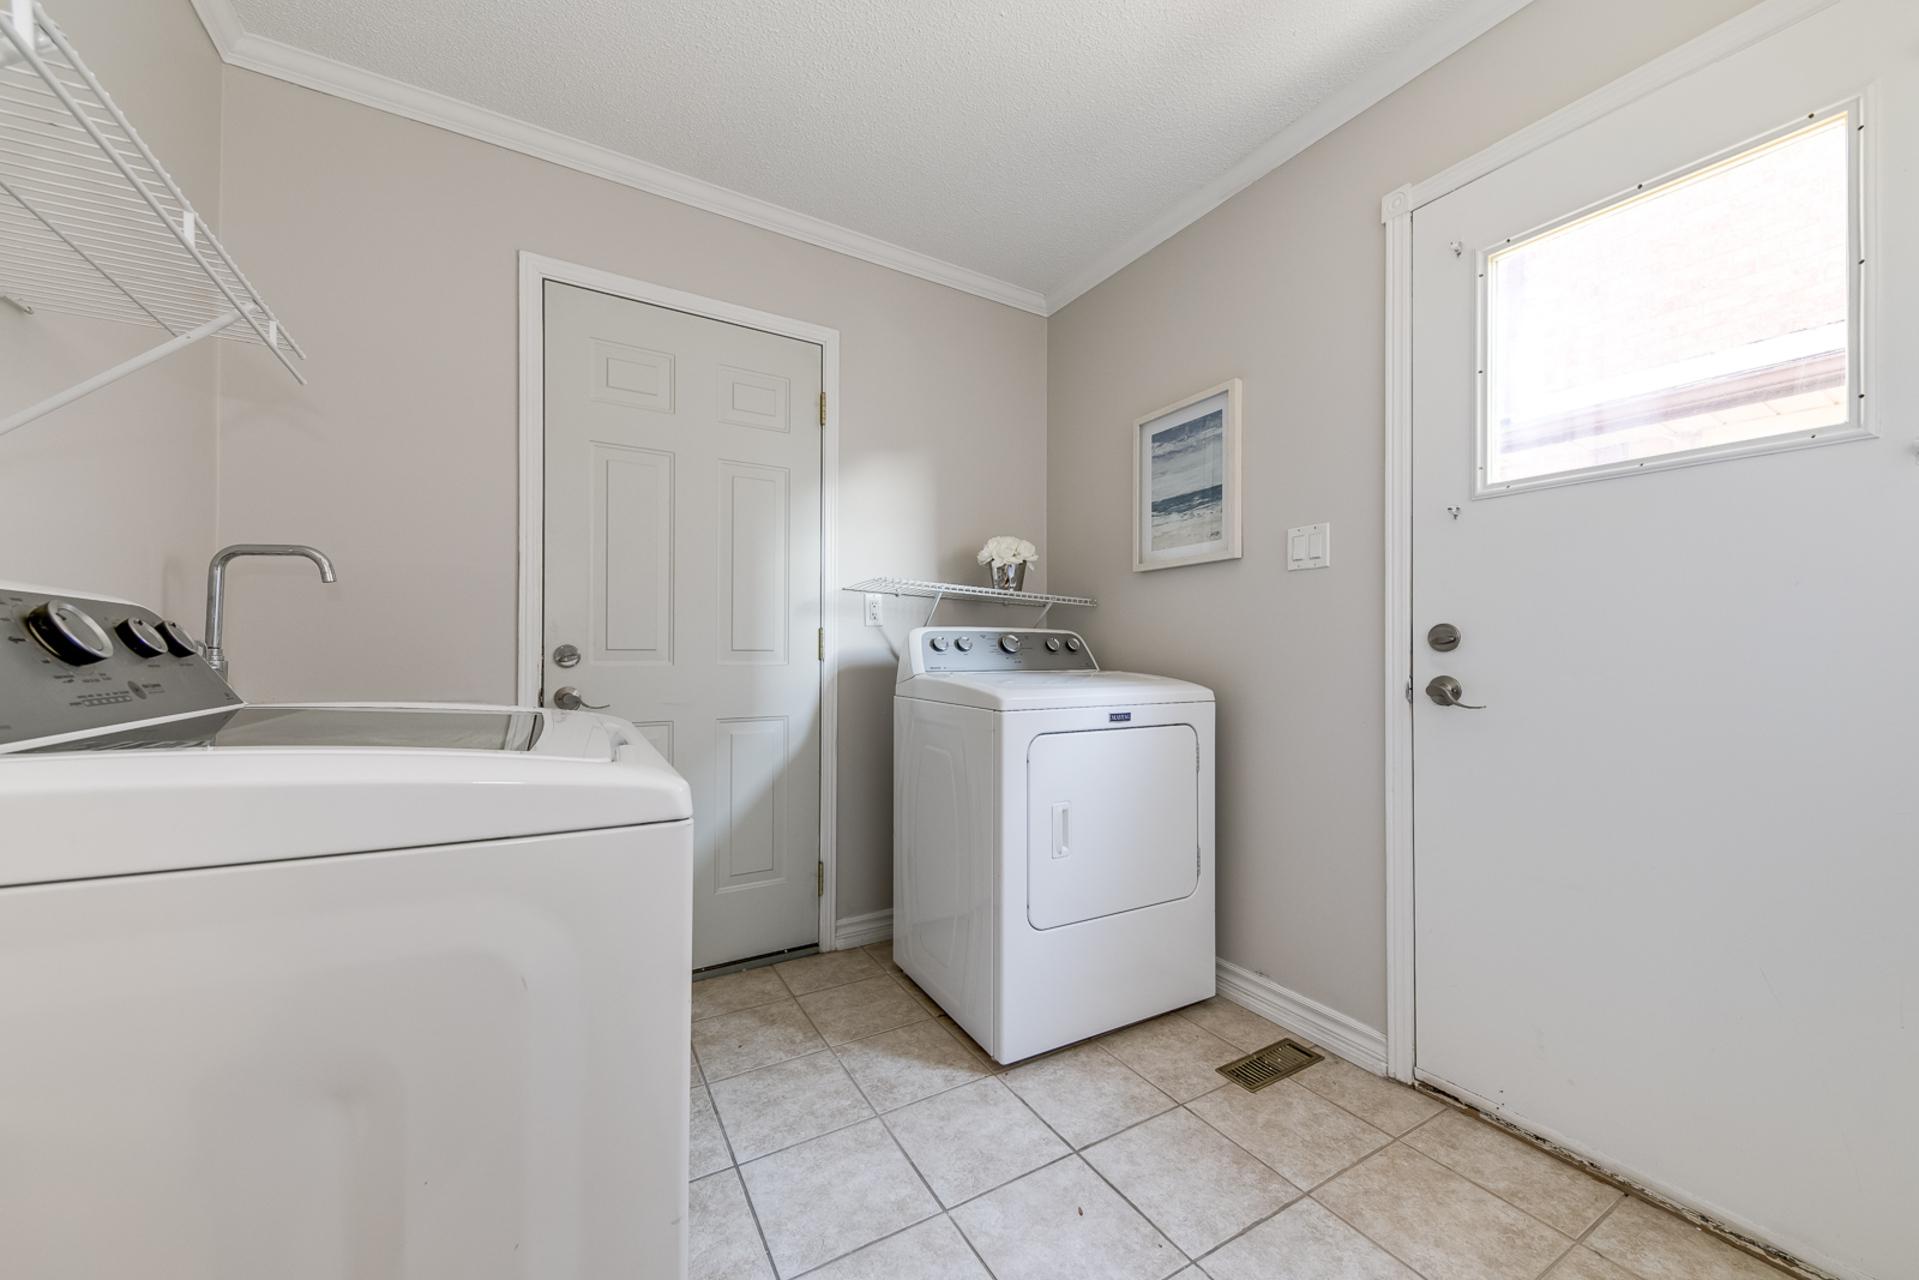 Laundry Room - 1509 Clearview Dr, Oakville - Elite3 & Team at 1509 Clearview Drive, Clearview, Oakville